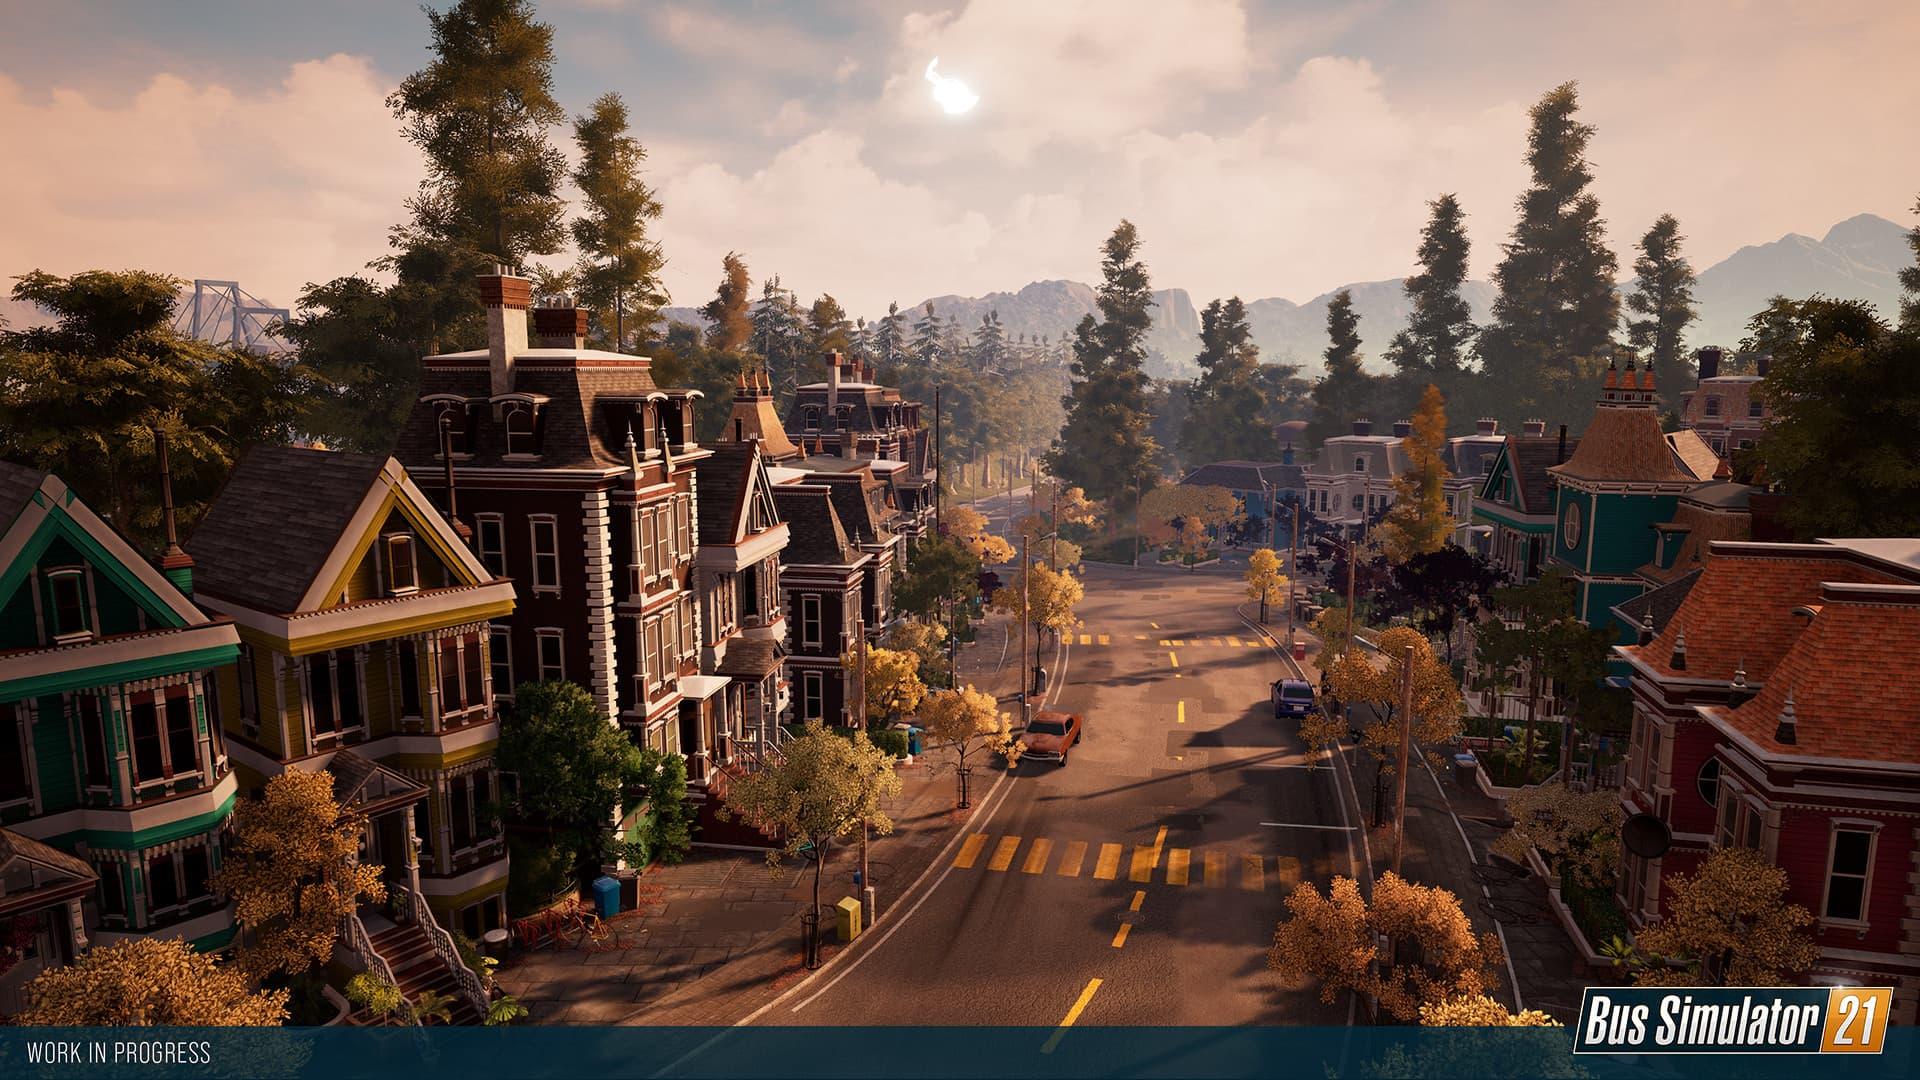 Xbox One Bus Simulator 21